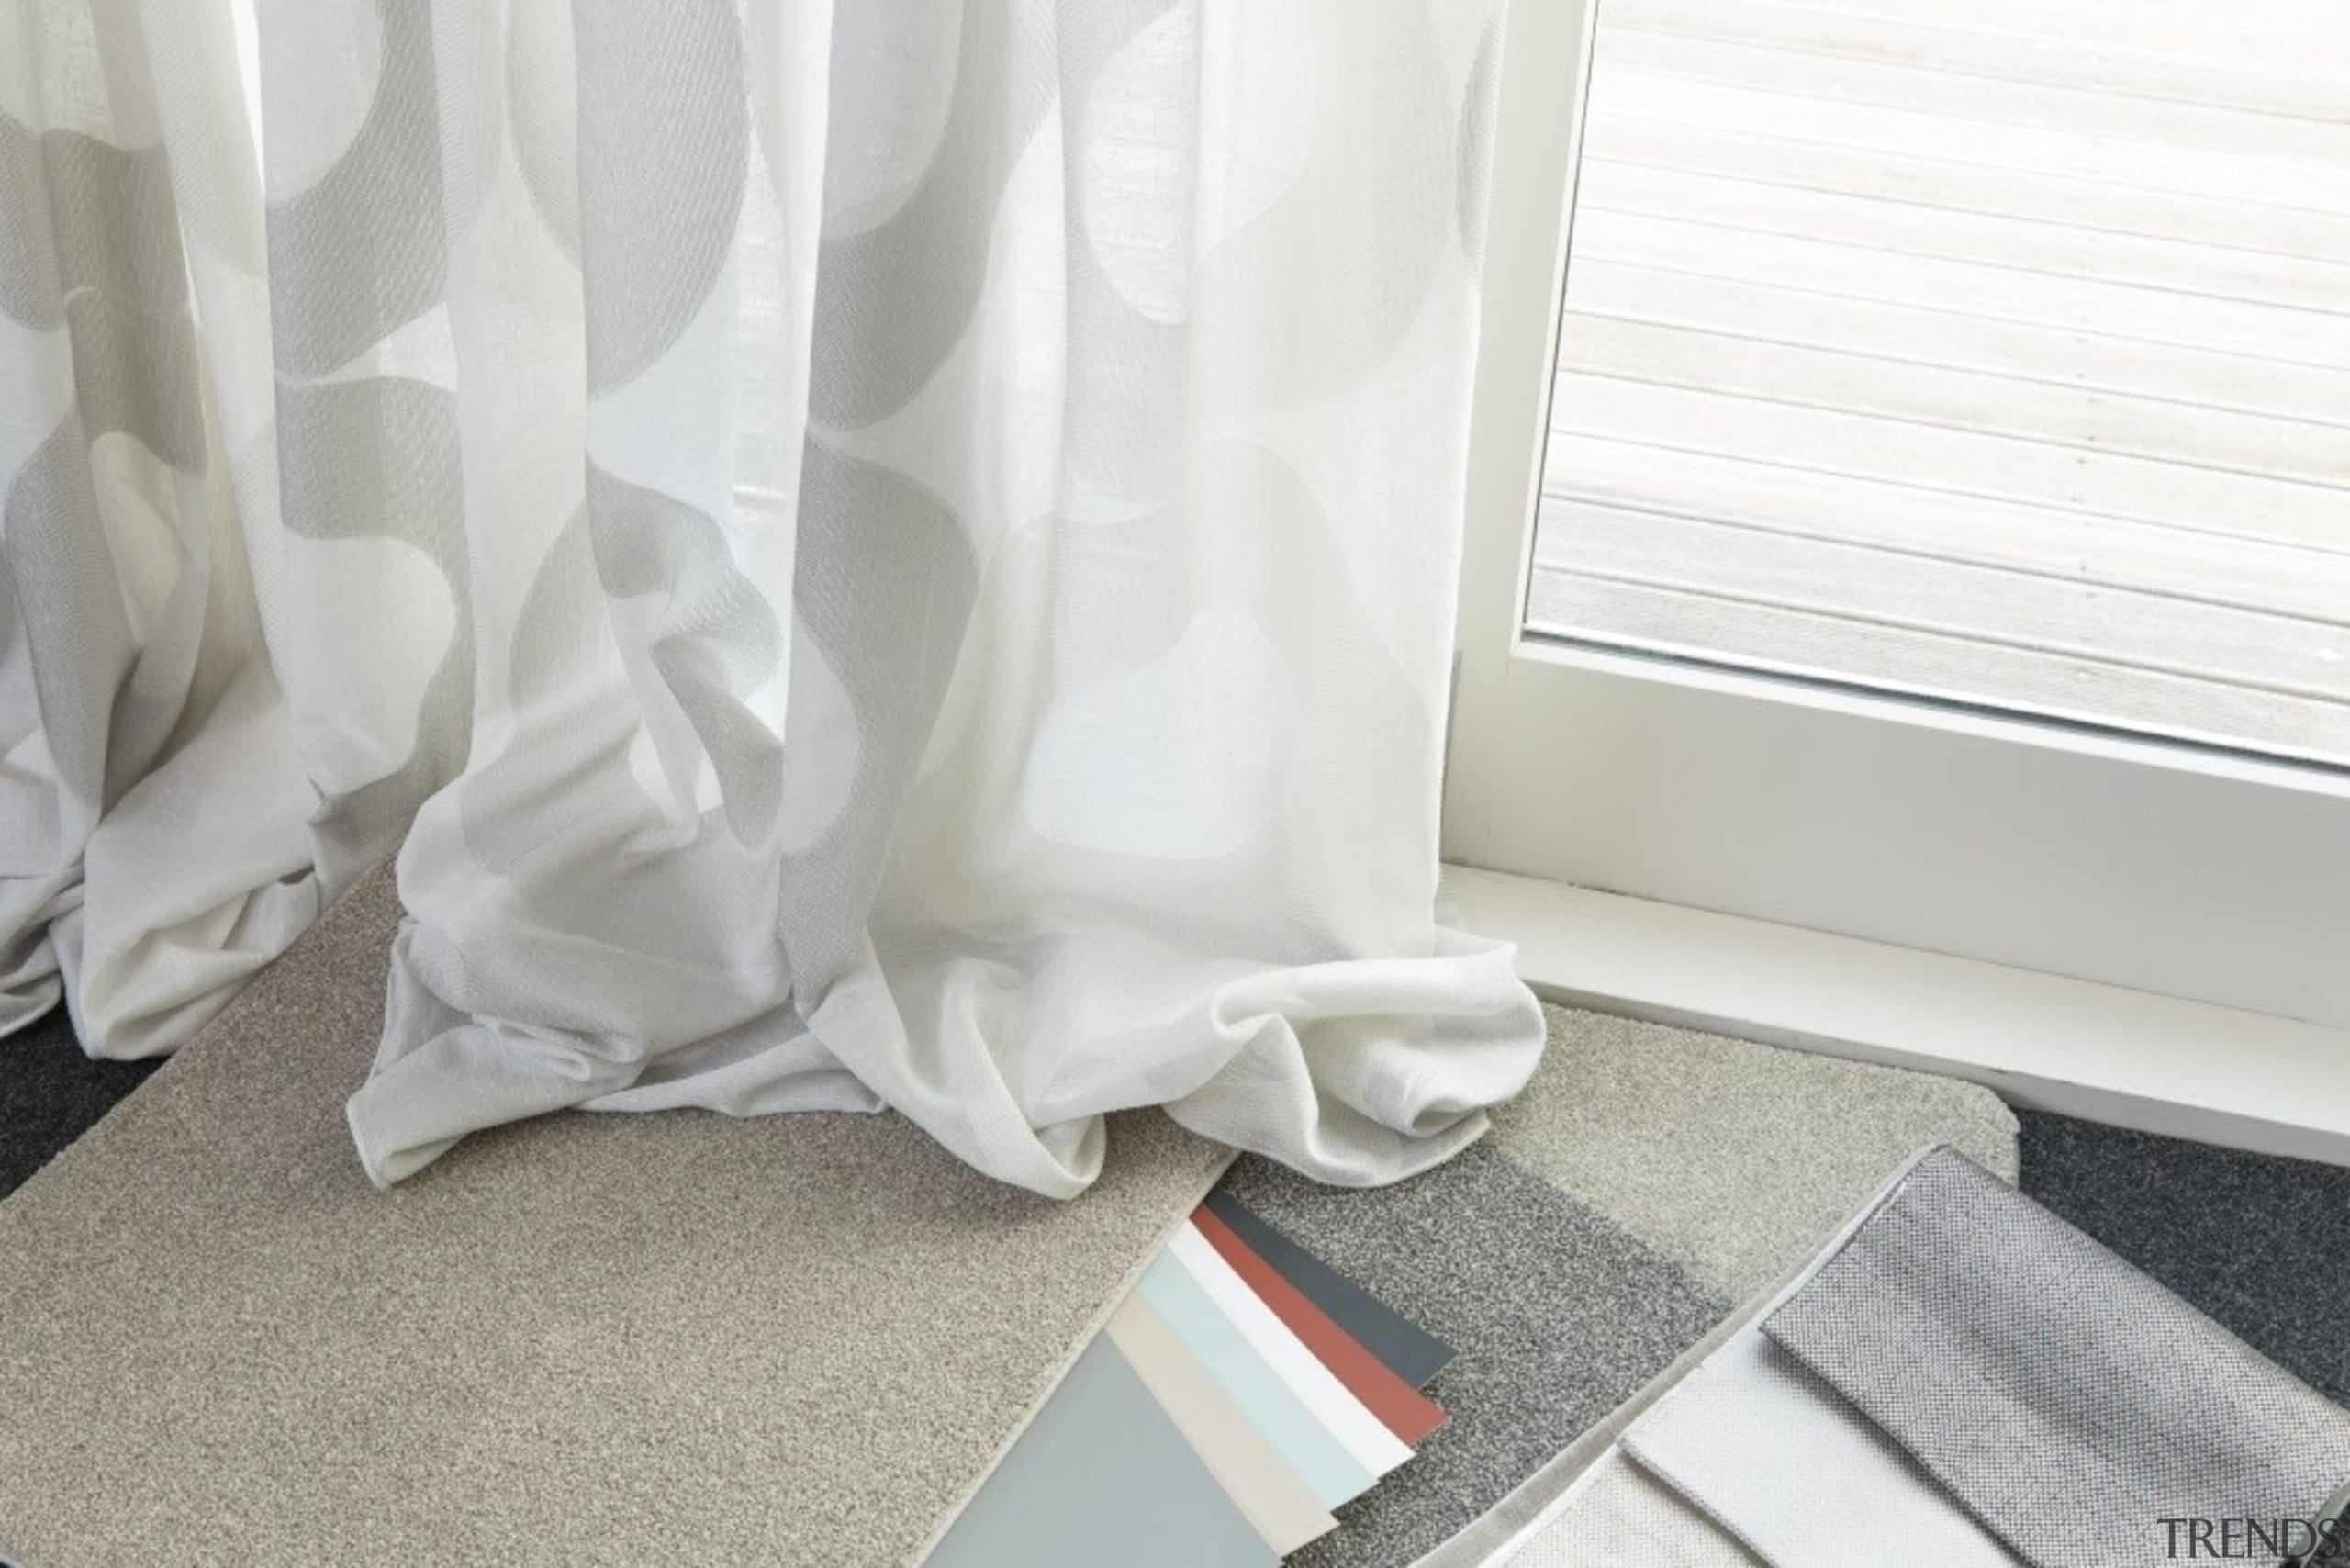 Harrisons Curtains - Harrisons Curtains - curtain | curtain, floor, flooring, interior design, linens, material, textile, white, window treatment, white